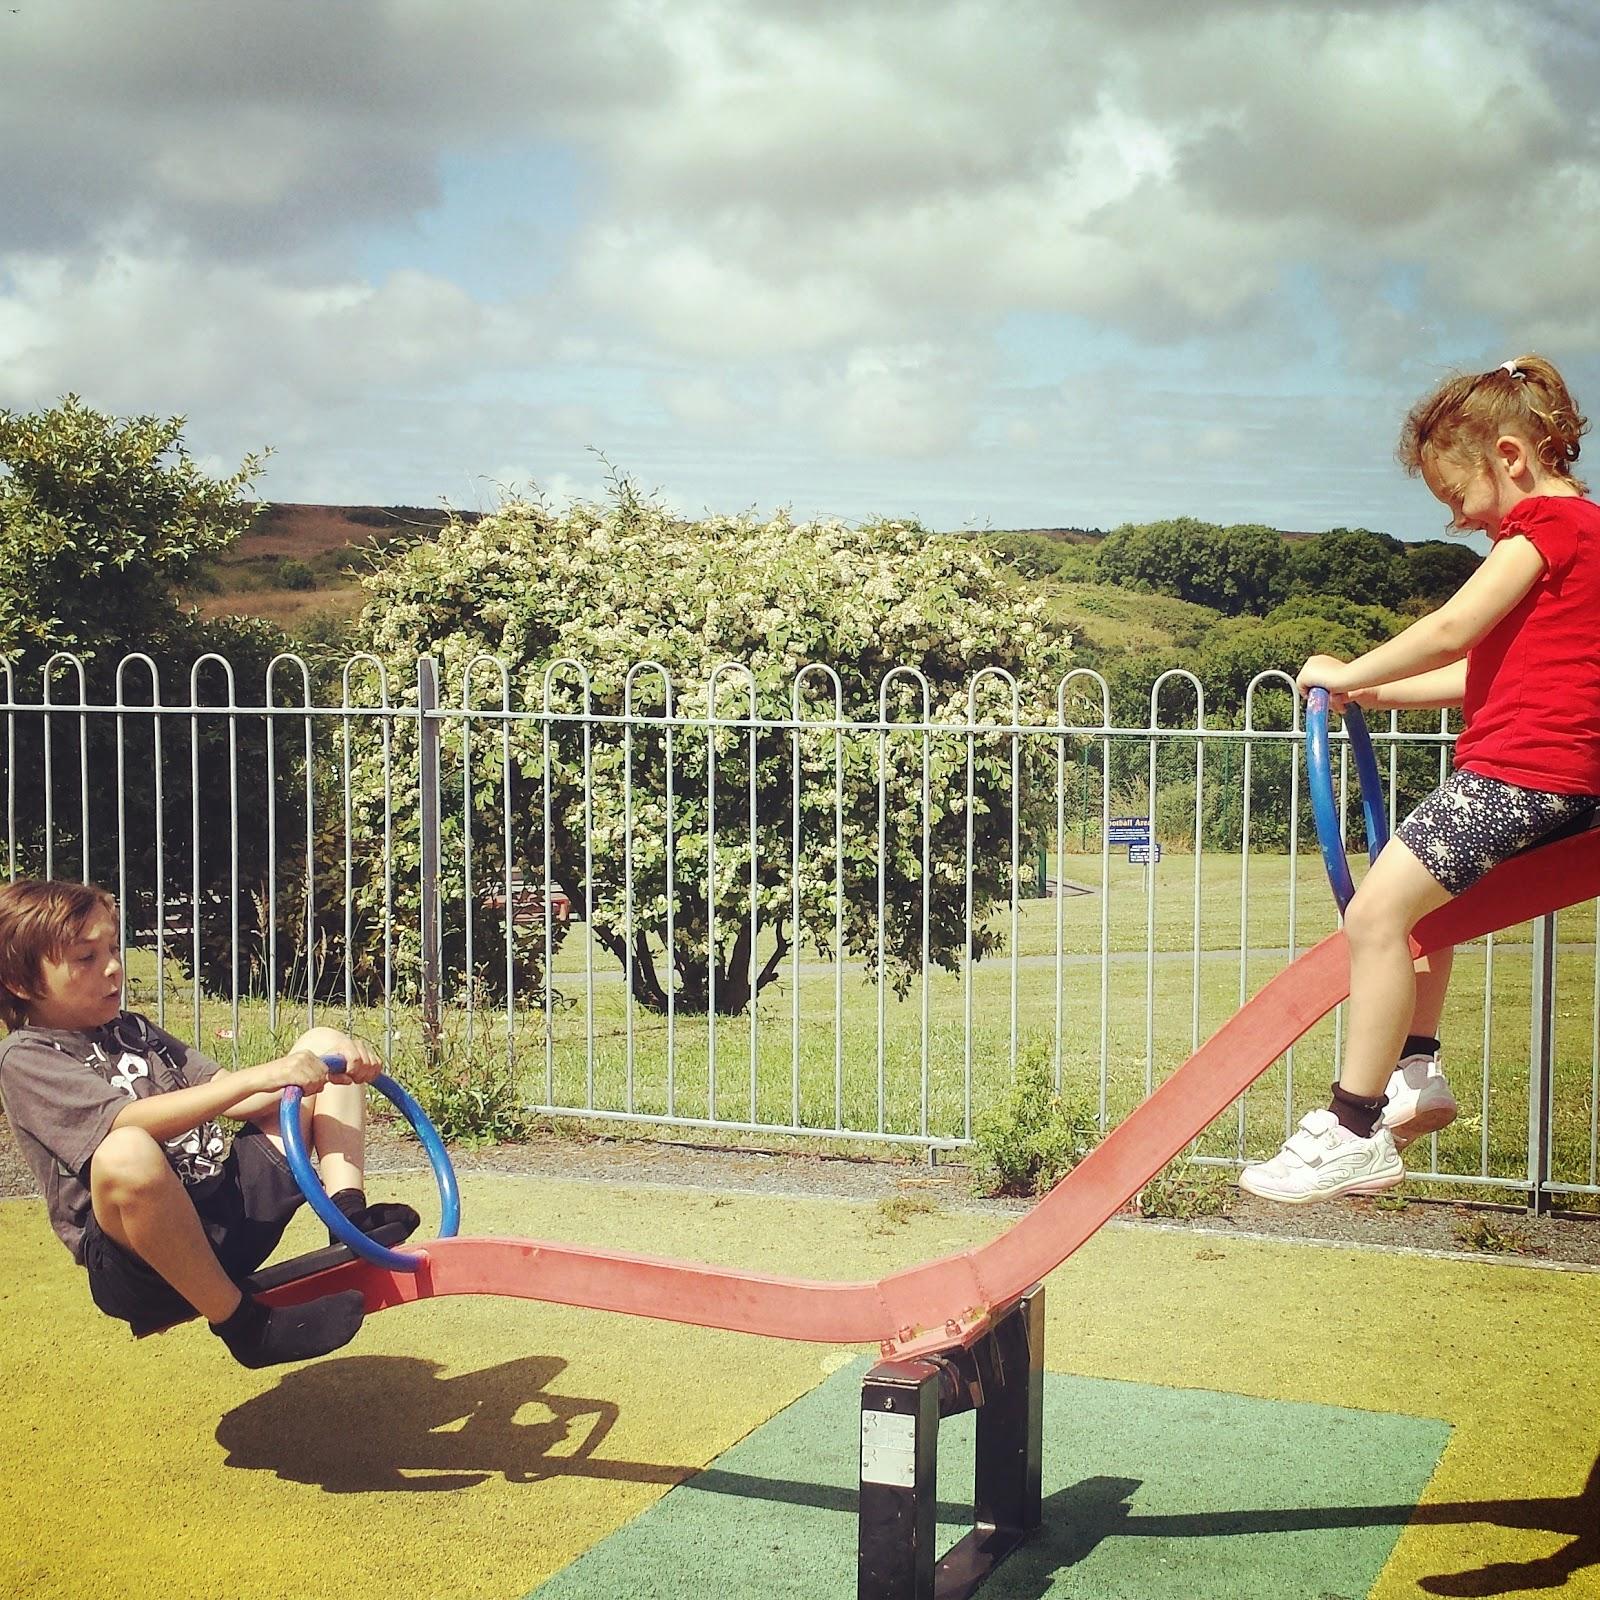 Danny Caitlyn See Saw park